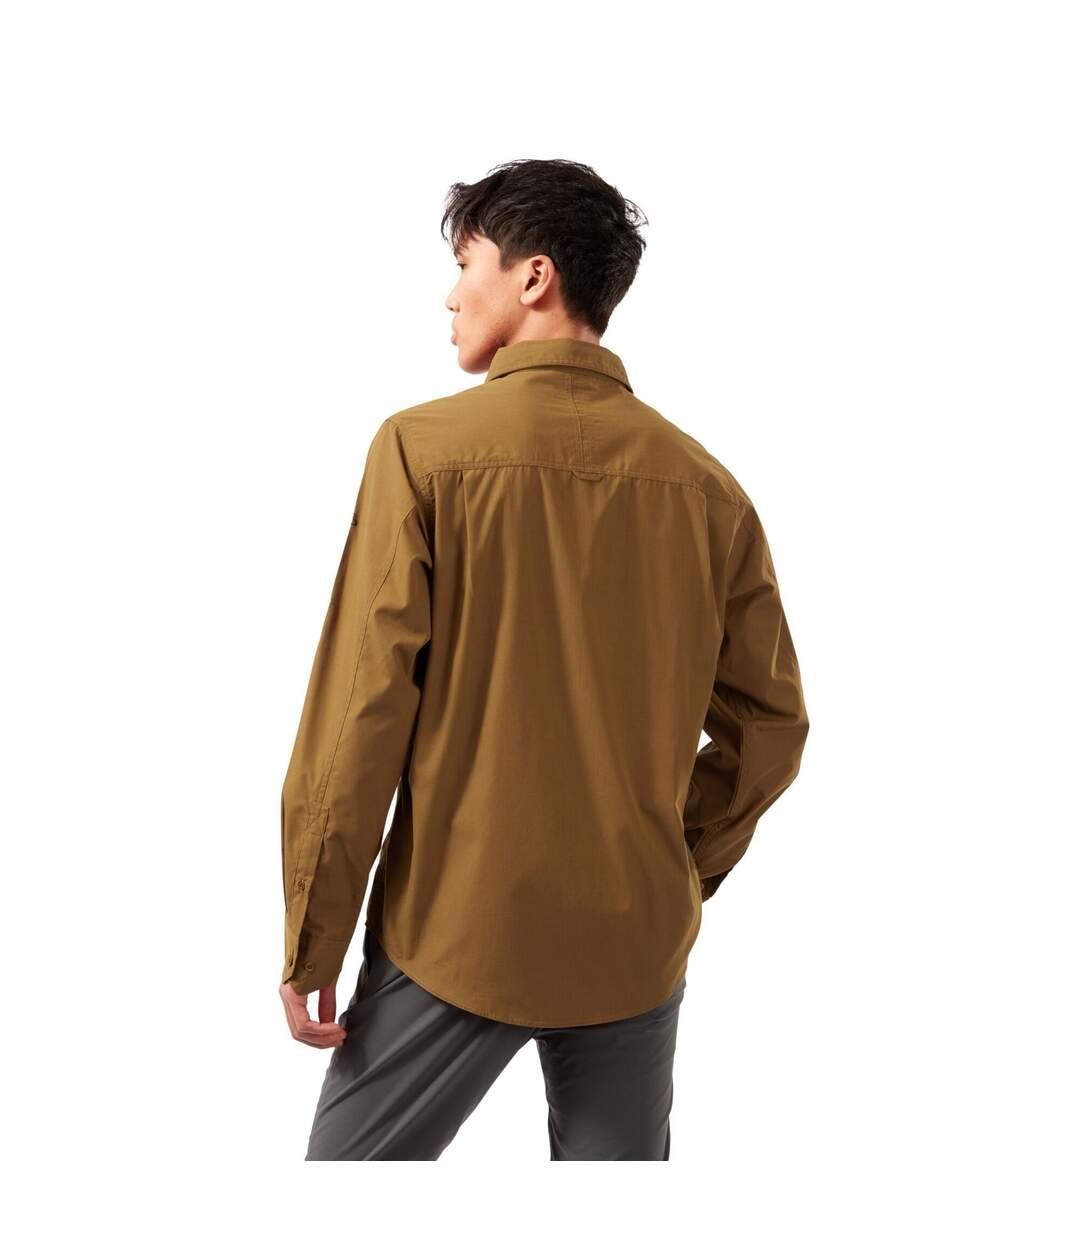 Craghoppers Mens Kiwi Long-Sleeved Shirt (Rubber Brown) - UTCG1500